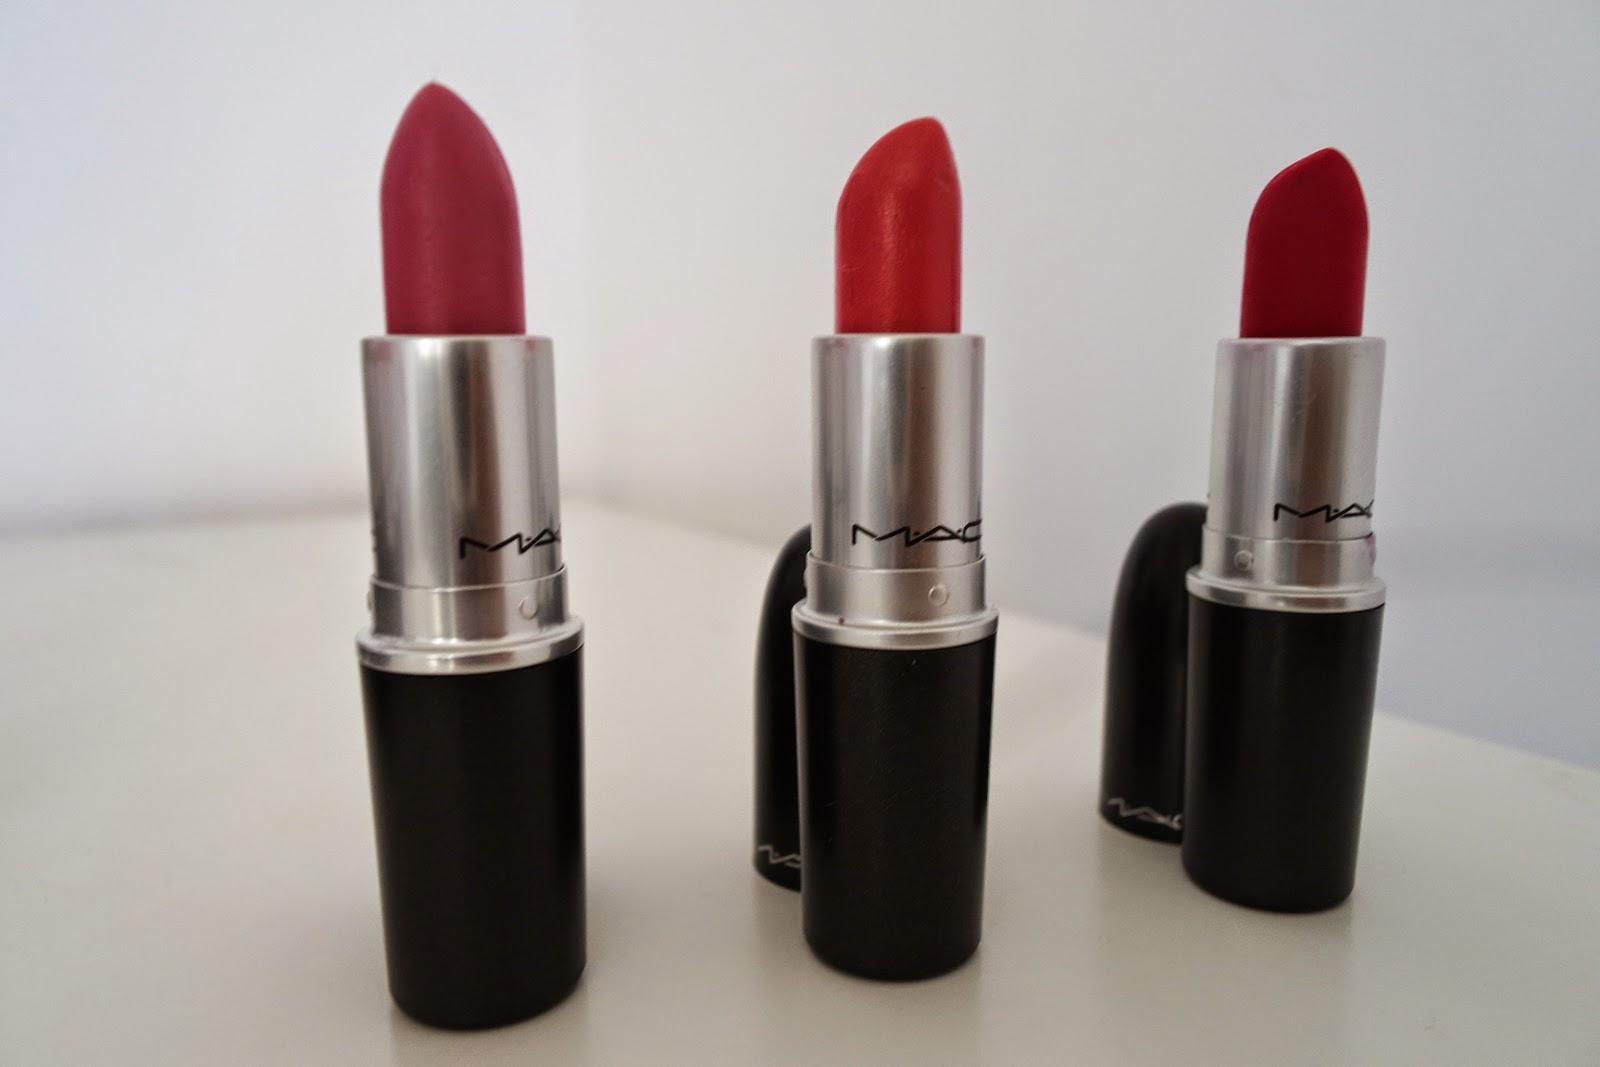 Mac cosmetics, lipstick